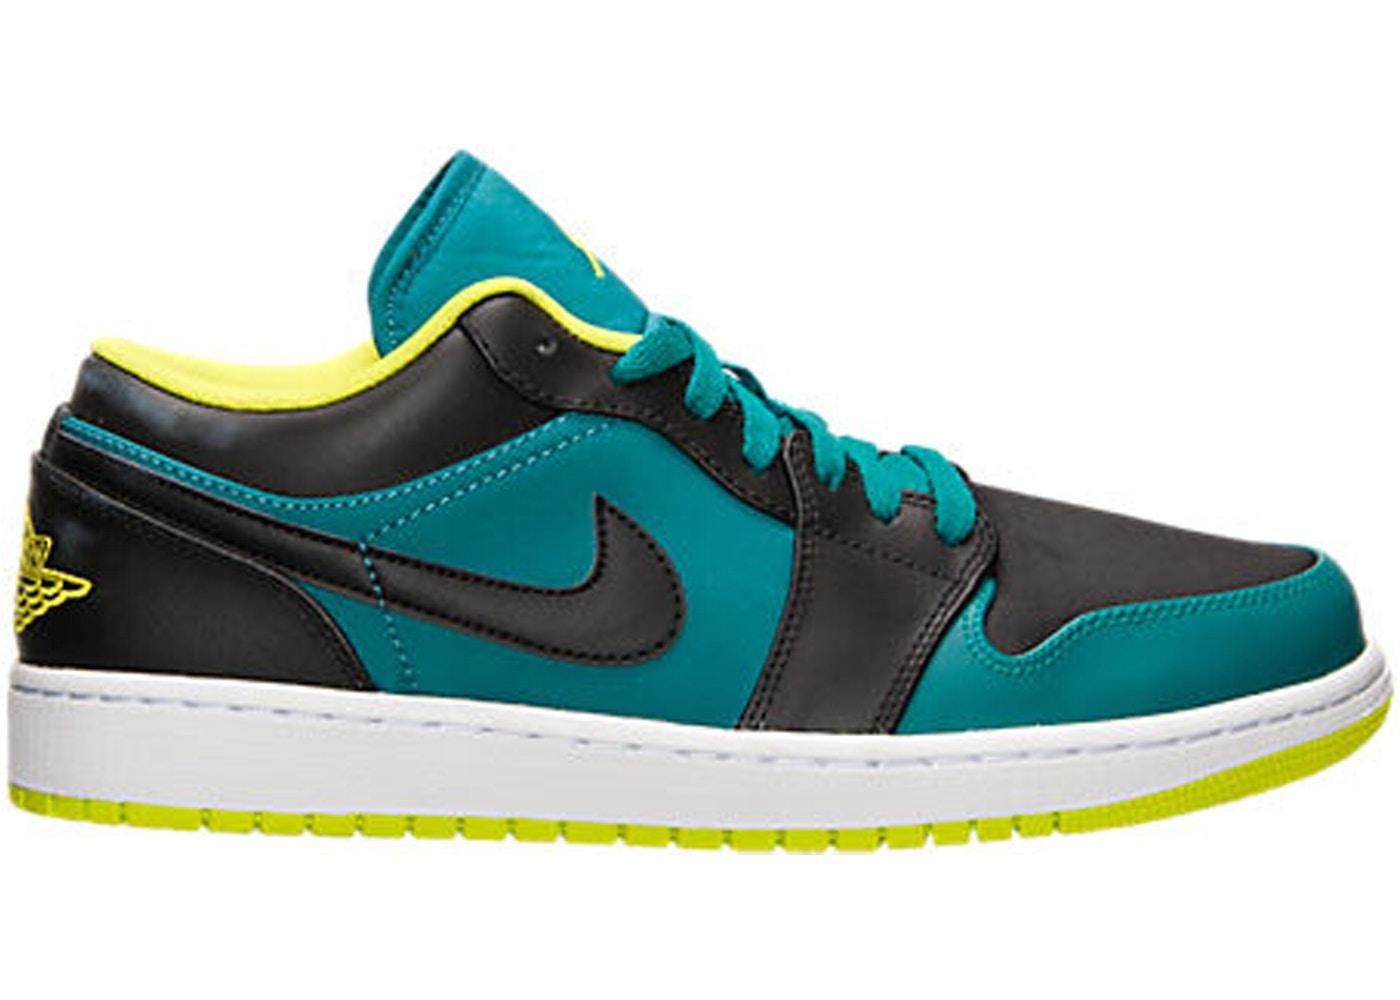 e338b447f66 Air Jordan 1 Shoes - New Highest Bids